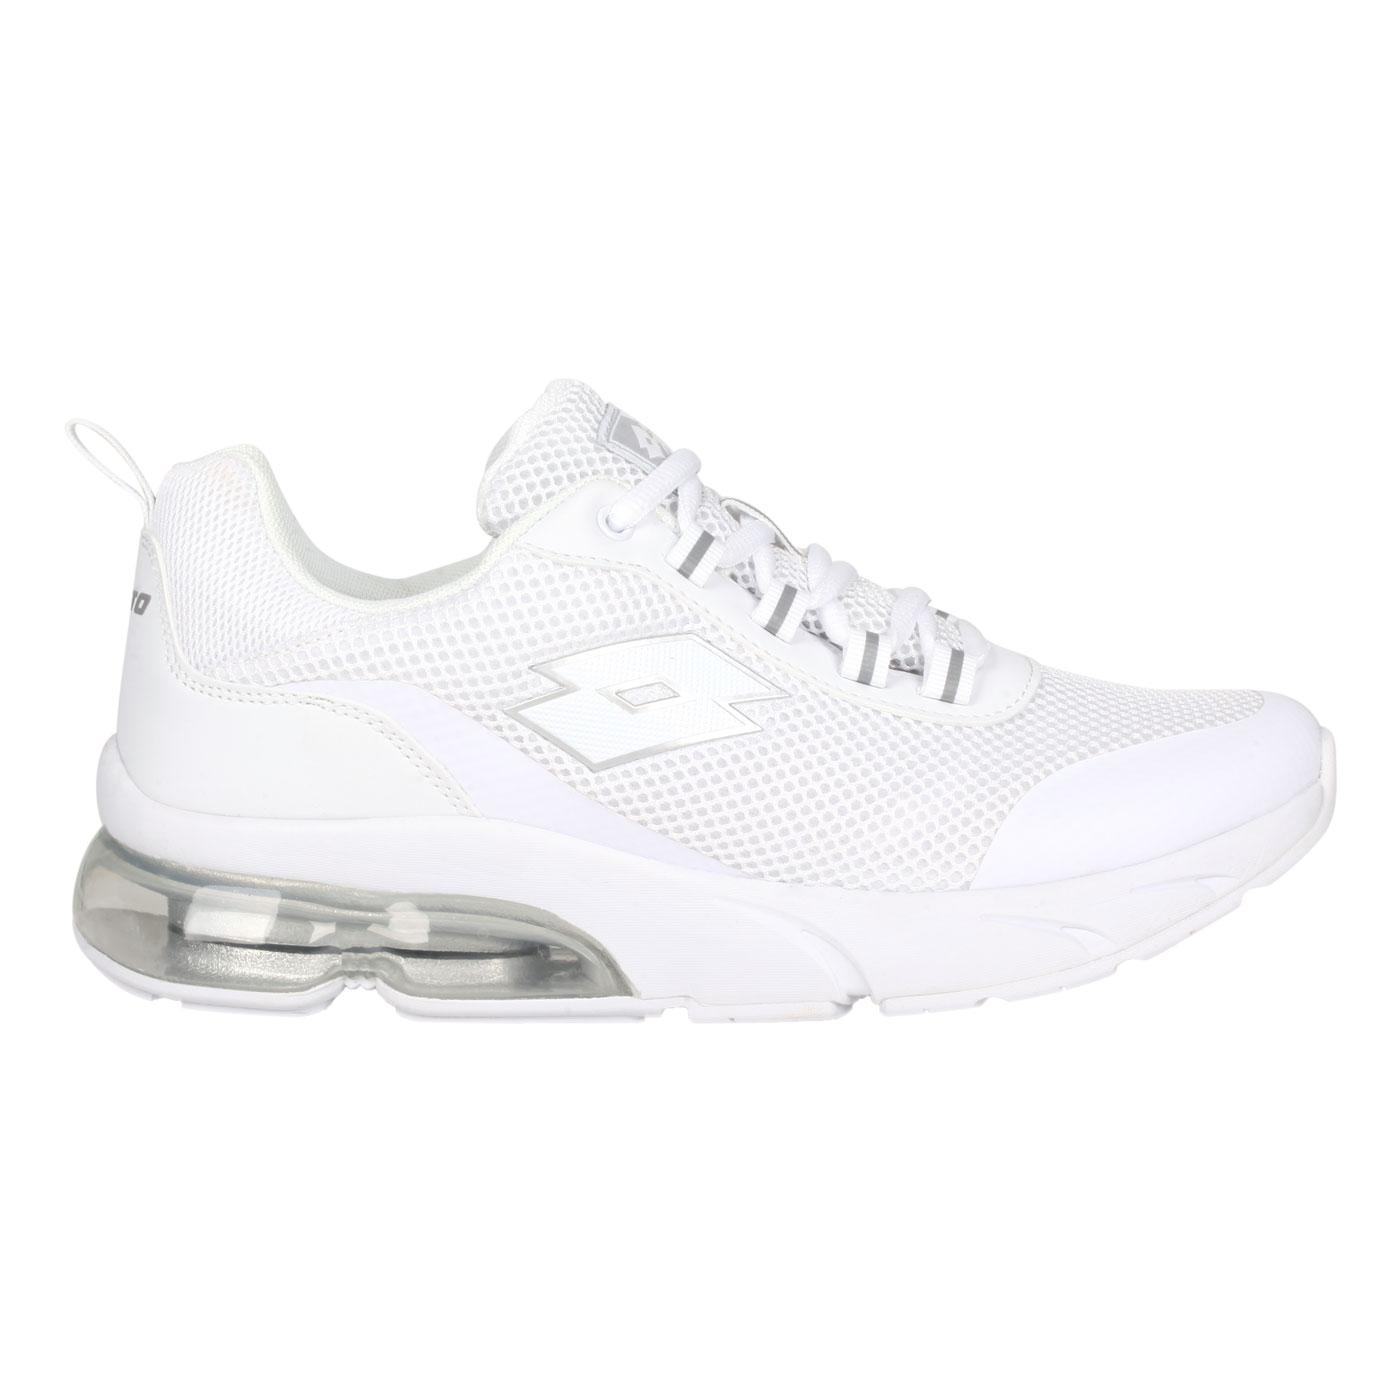 LOTTO 女款AERO POWER II運動鞋 LT1AWR3909 - 白銀